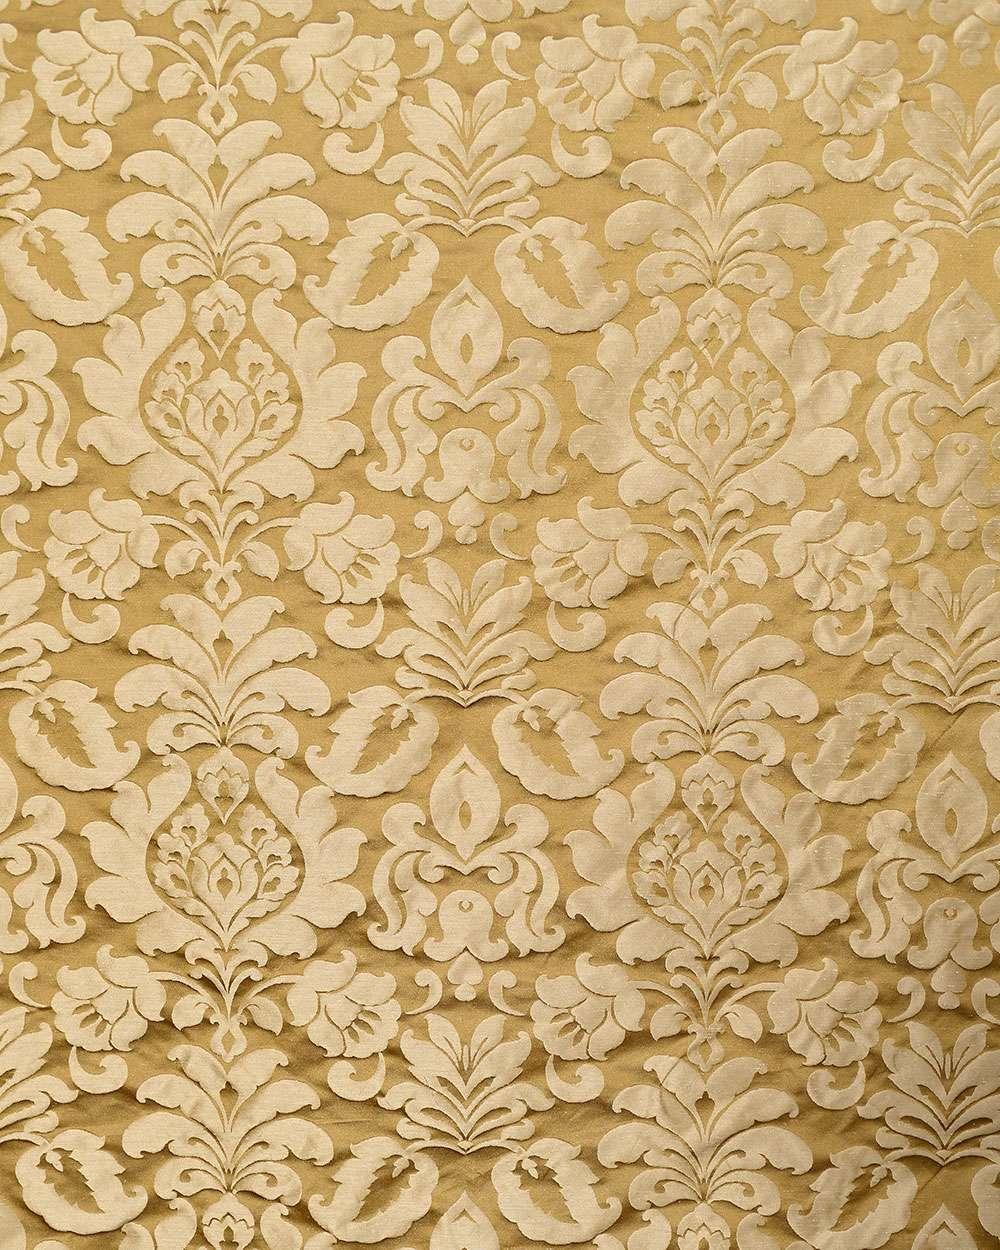 Curtains texture gold - Curtains Texture Gold 25